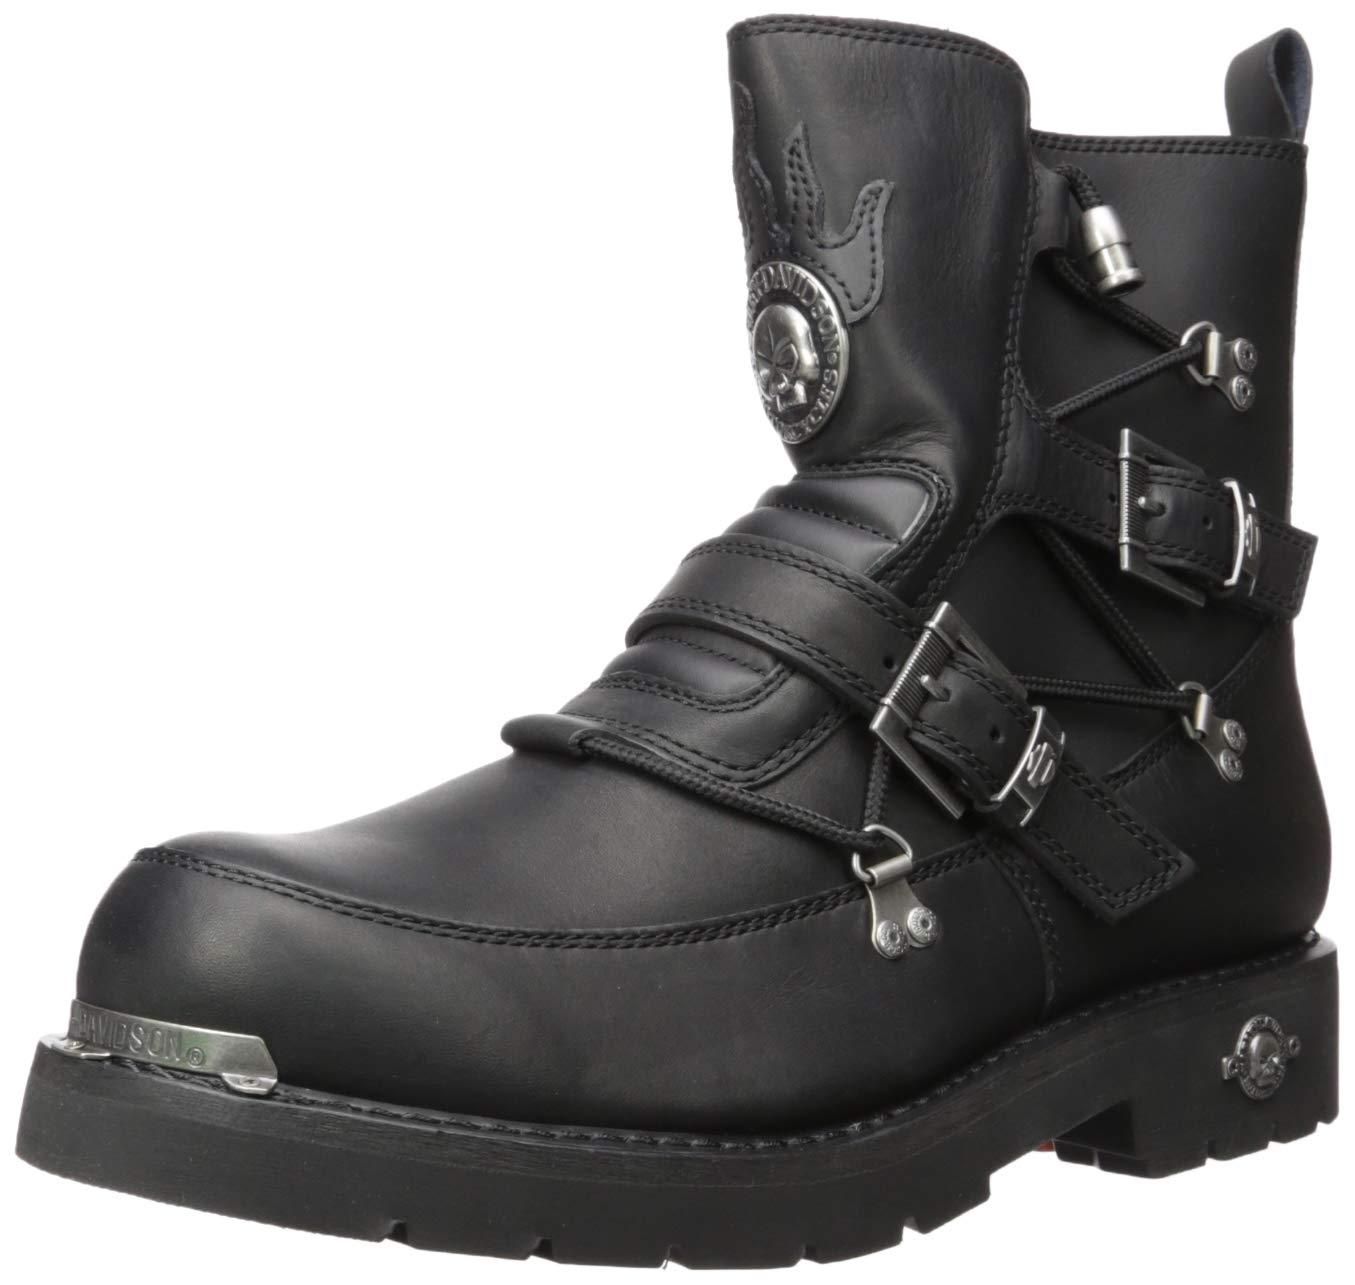 Harley-Davidson Men's Distortion Riding Boot,Black,11 W US